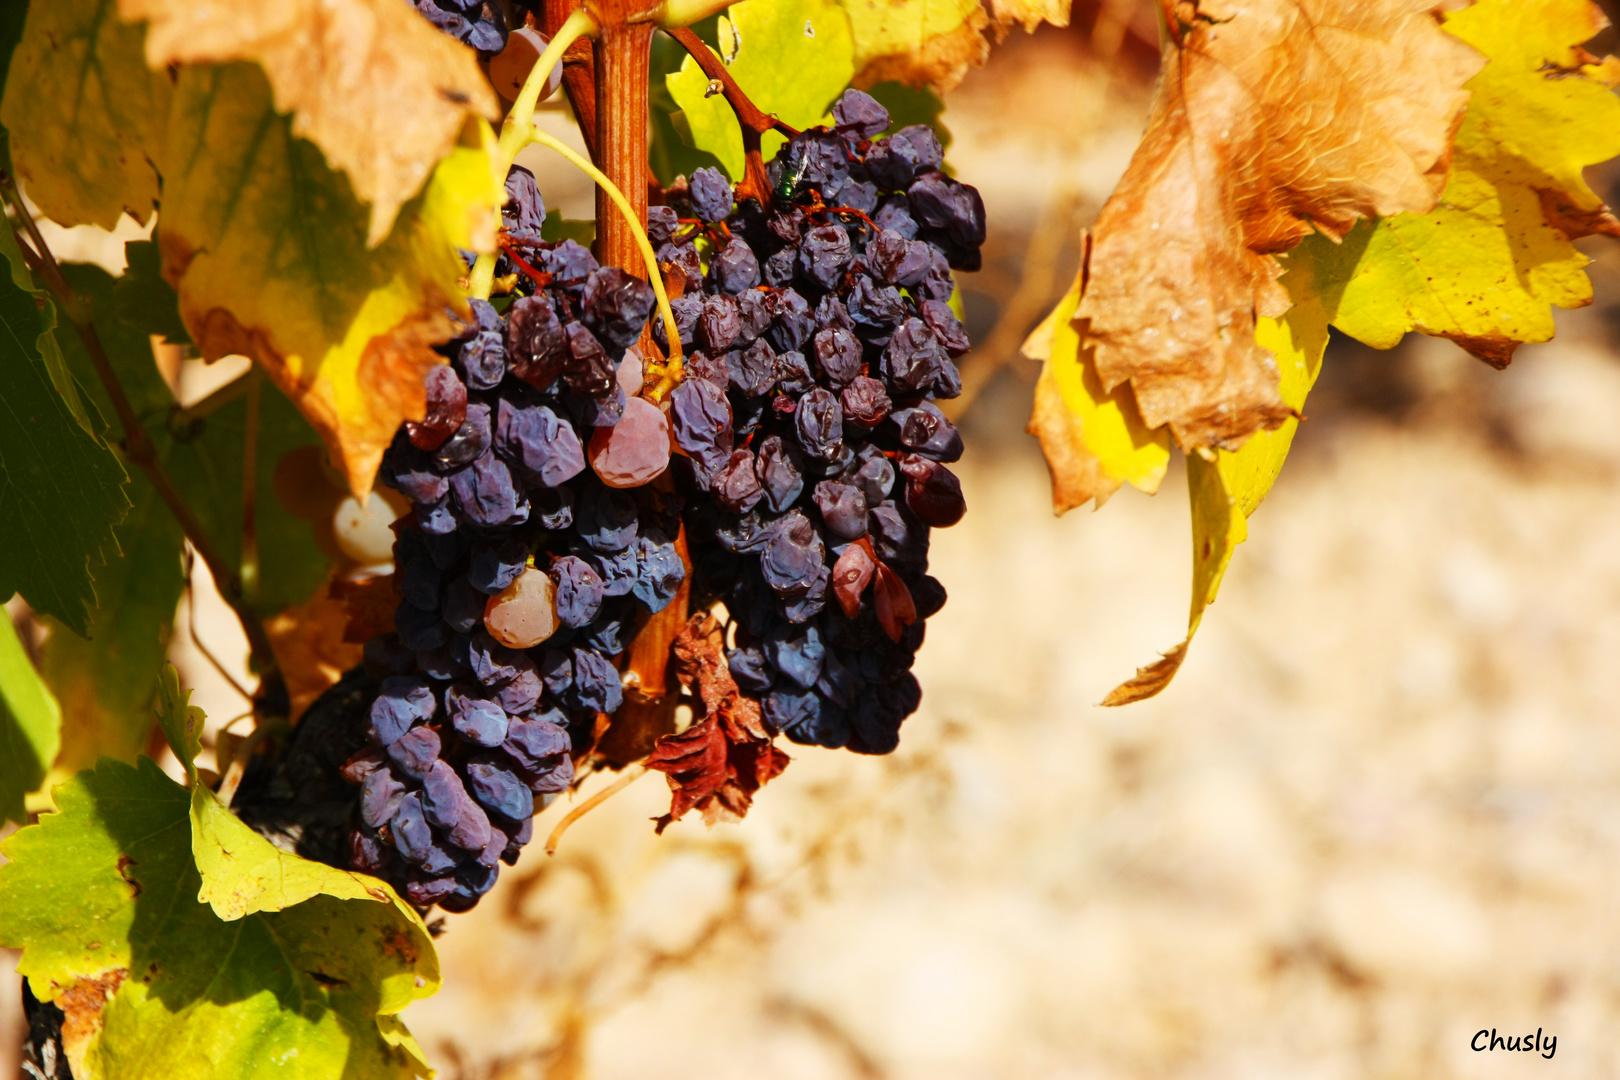 Racimo de uvas pasas - Bunch of raisins